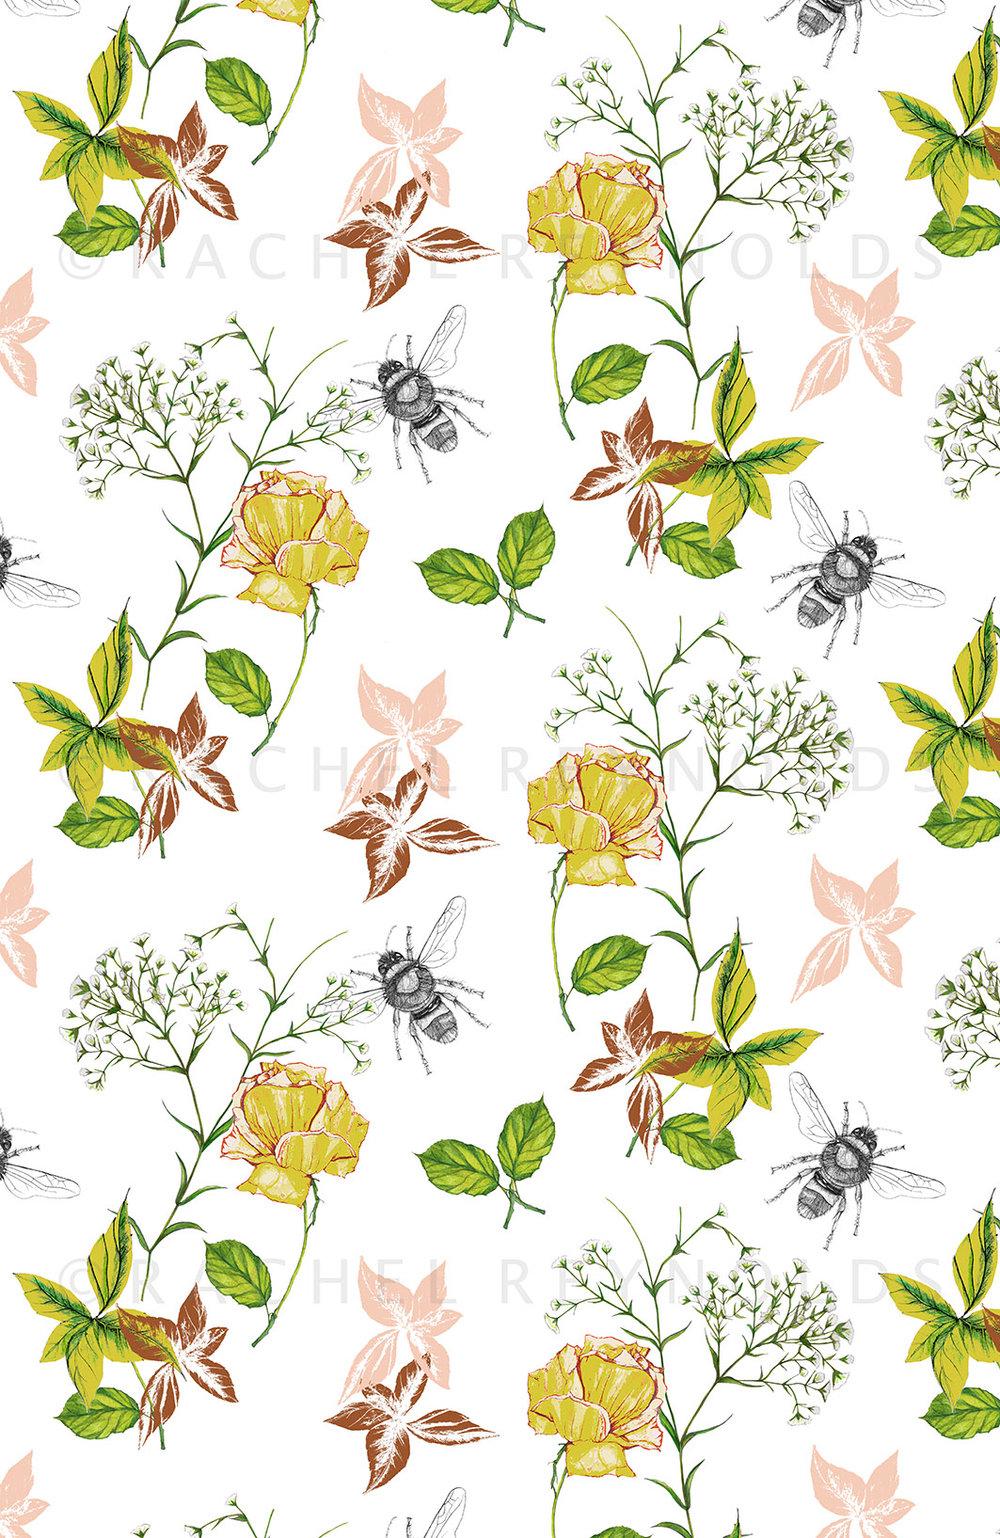 Flora & Fauna White